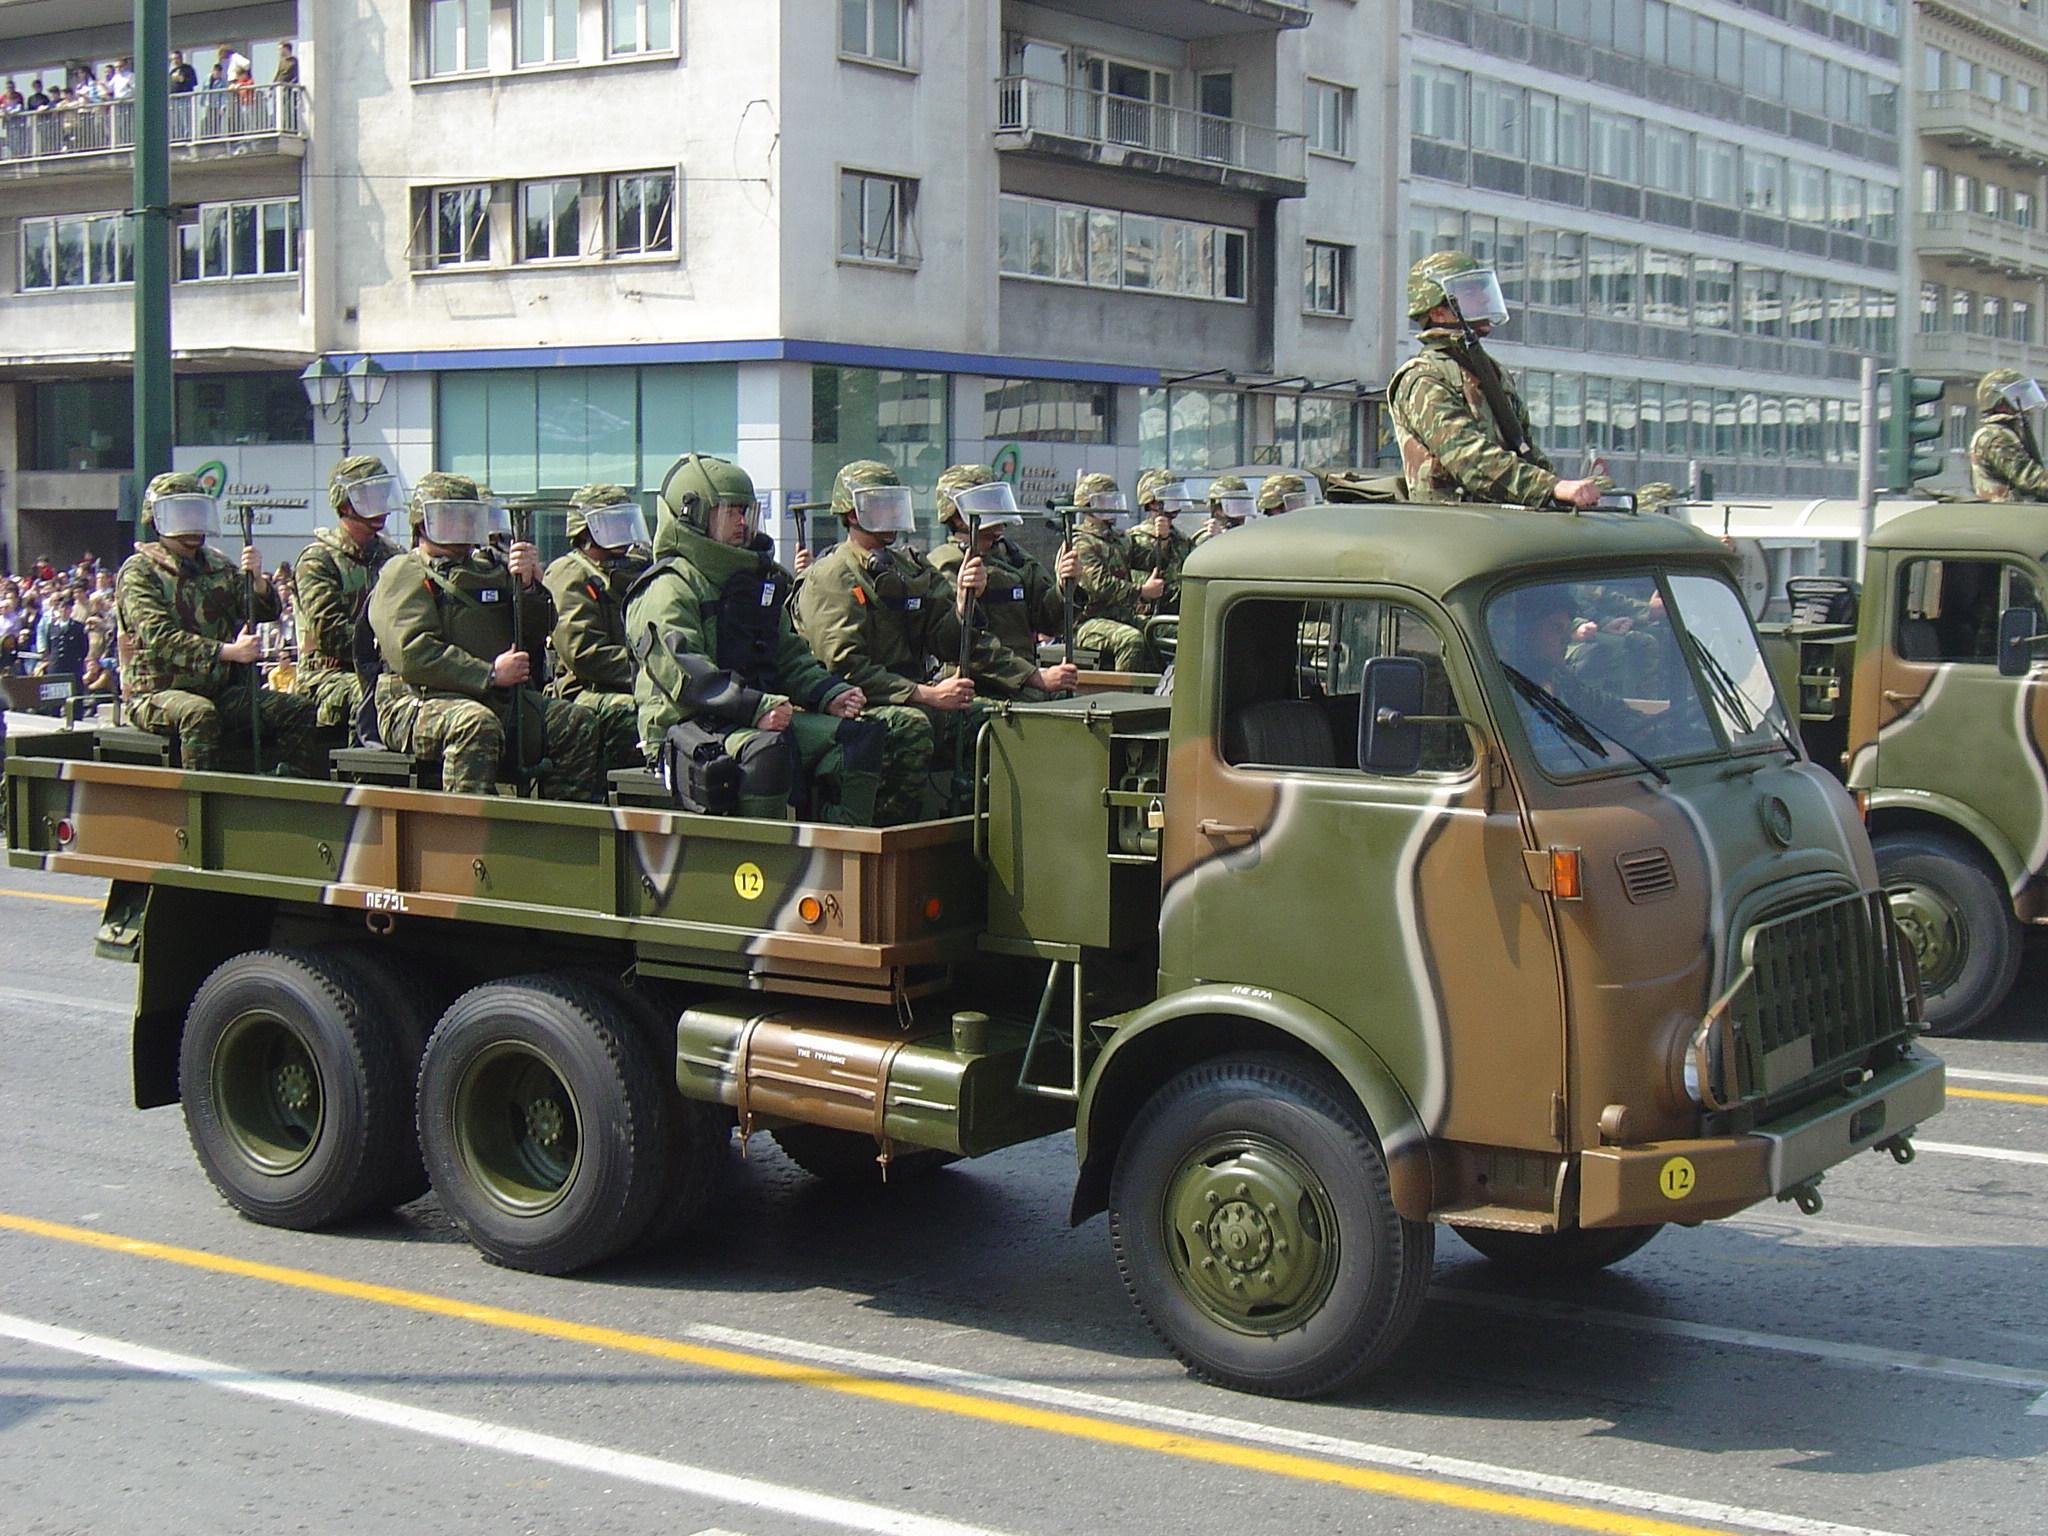 Photo of Ελληνικής σχεδίασης φορτηγό ή συμπαραγωγή ξένου για τον Ελληνικό Στρατό;